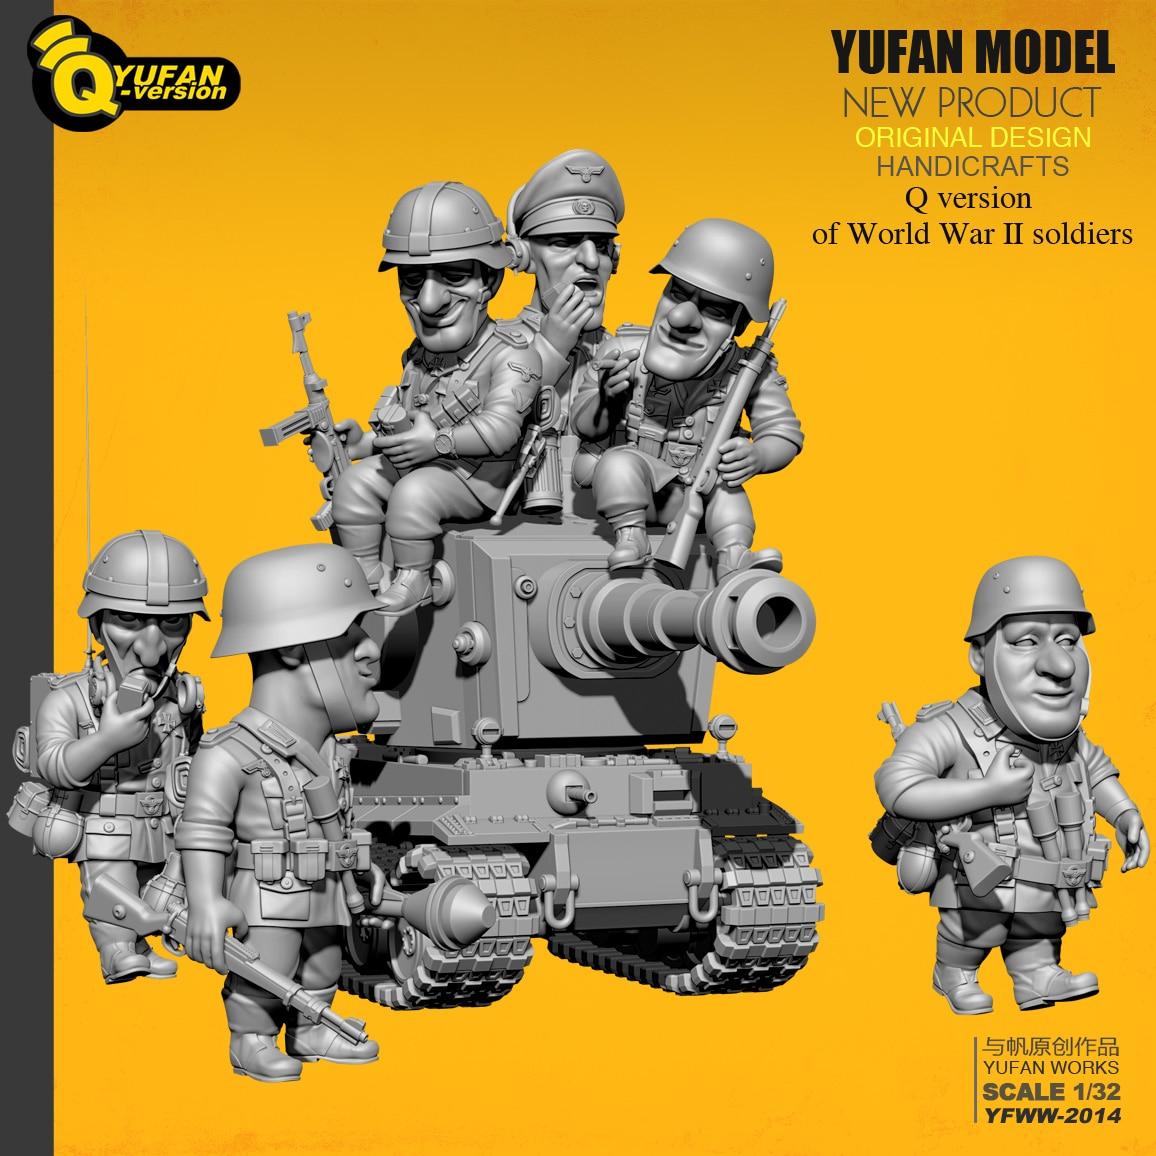 YUFan Model And Sail Original 1/32 Q Version Of World War II Resin Soldier Full Set YFWW-2015 Pre-sale KNL Hobby